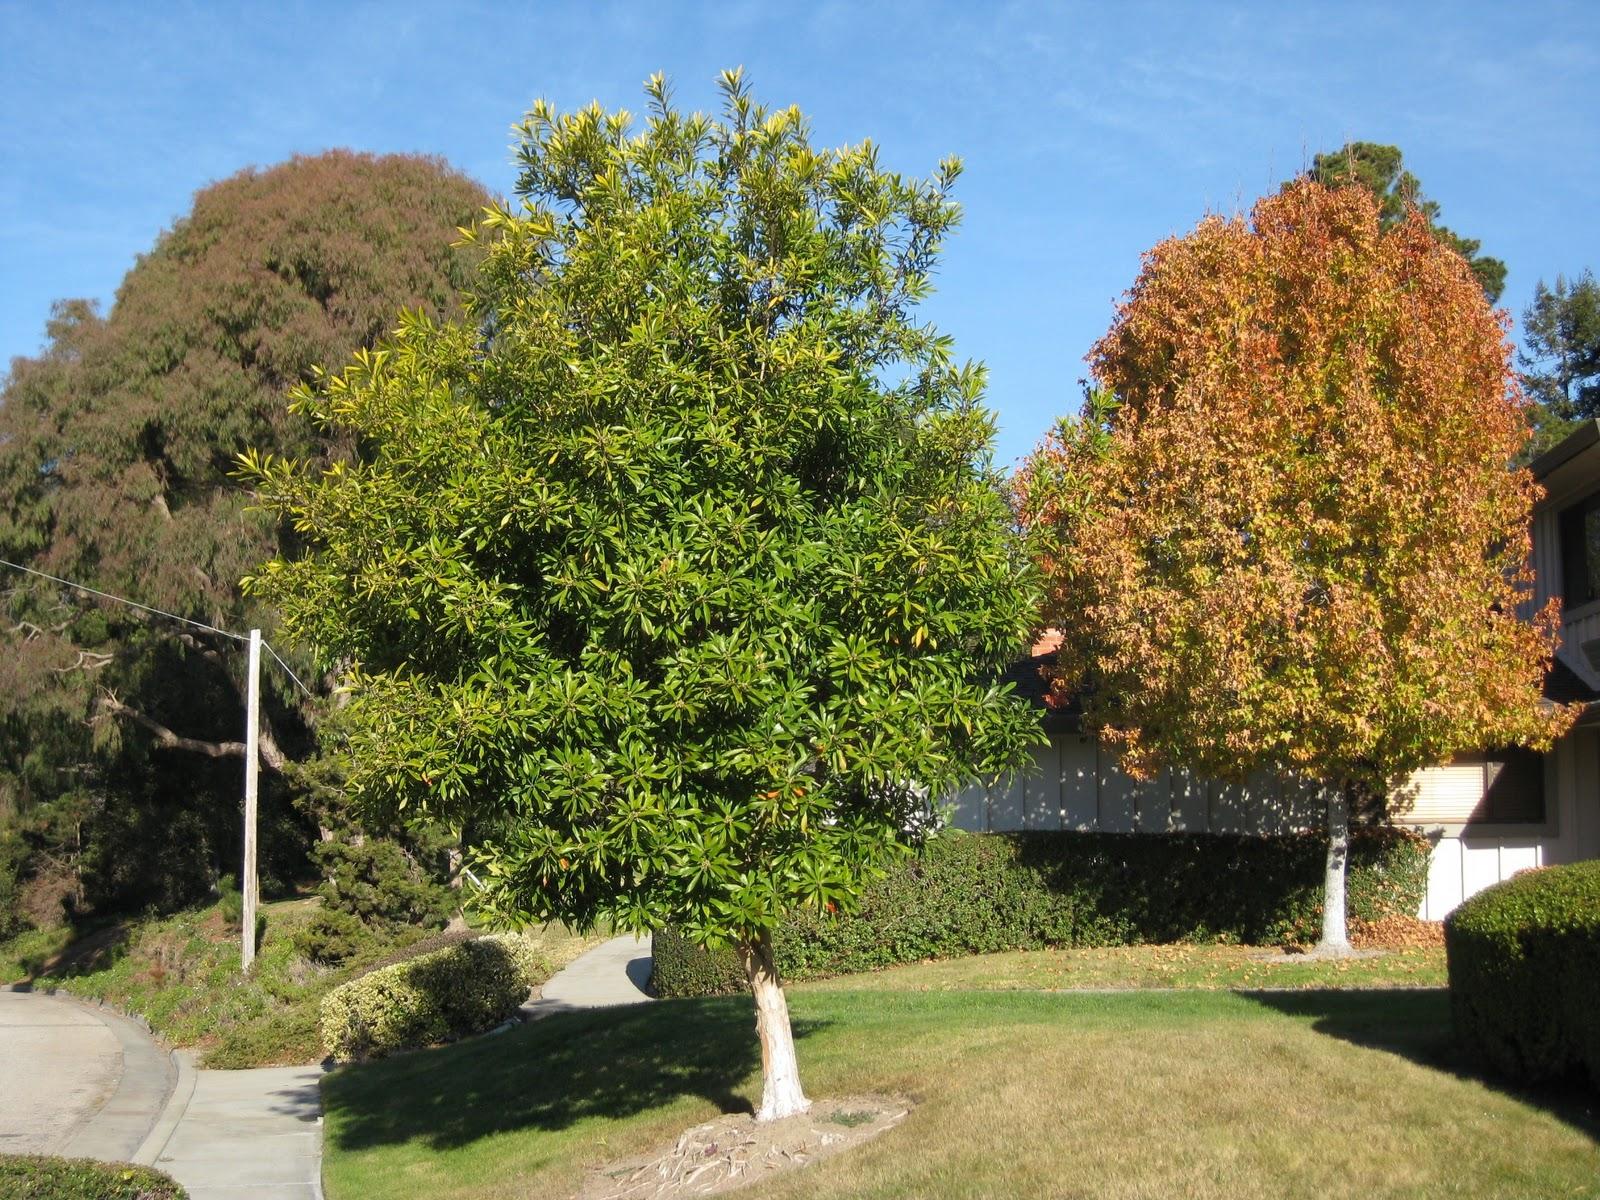 Trees Of Santa Cruz County: Tristaniopsis Laurina